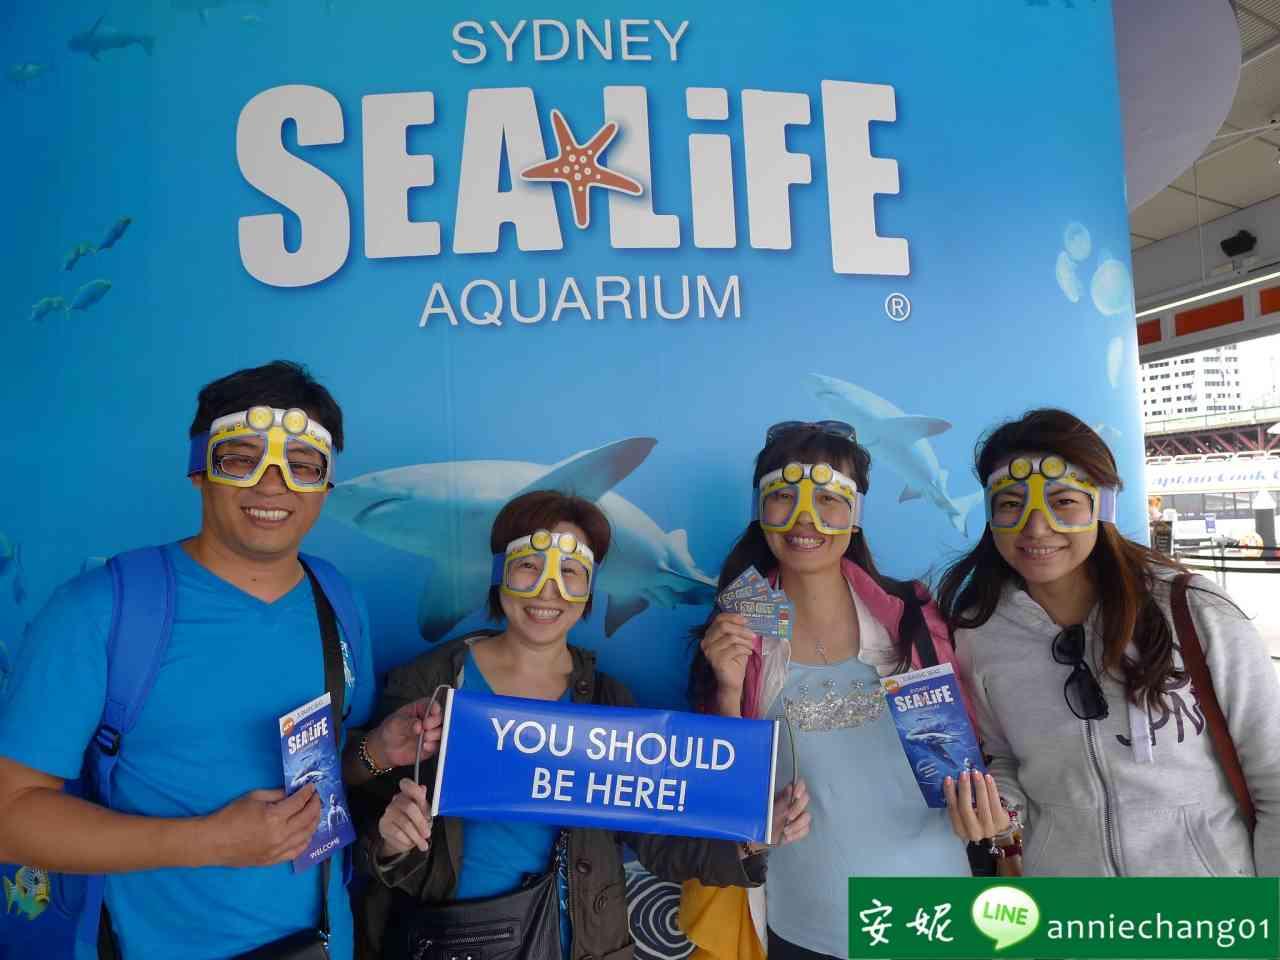 【澳洲 雪梨】Sydney Sealife Aquarium 水族館